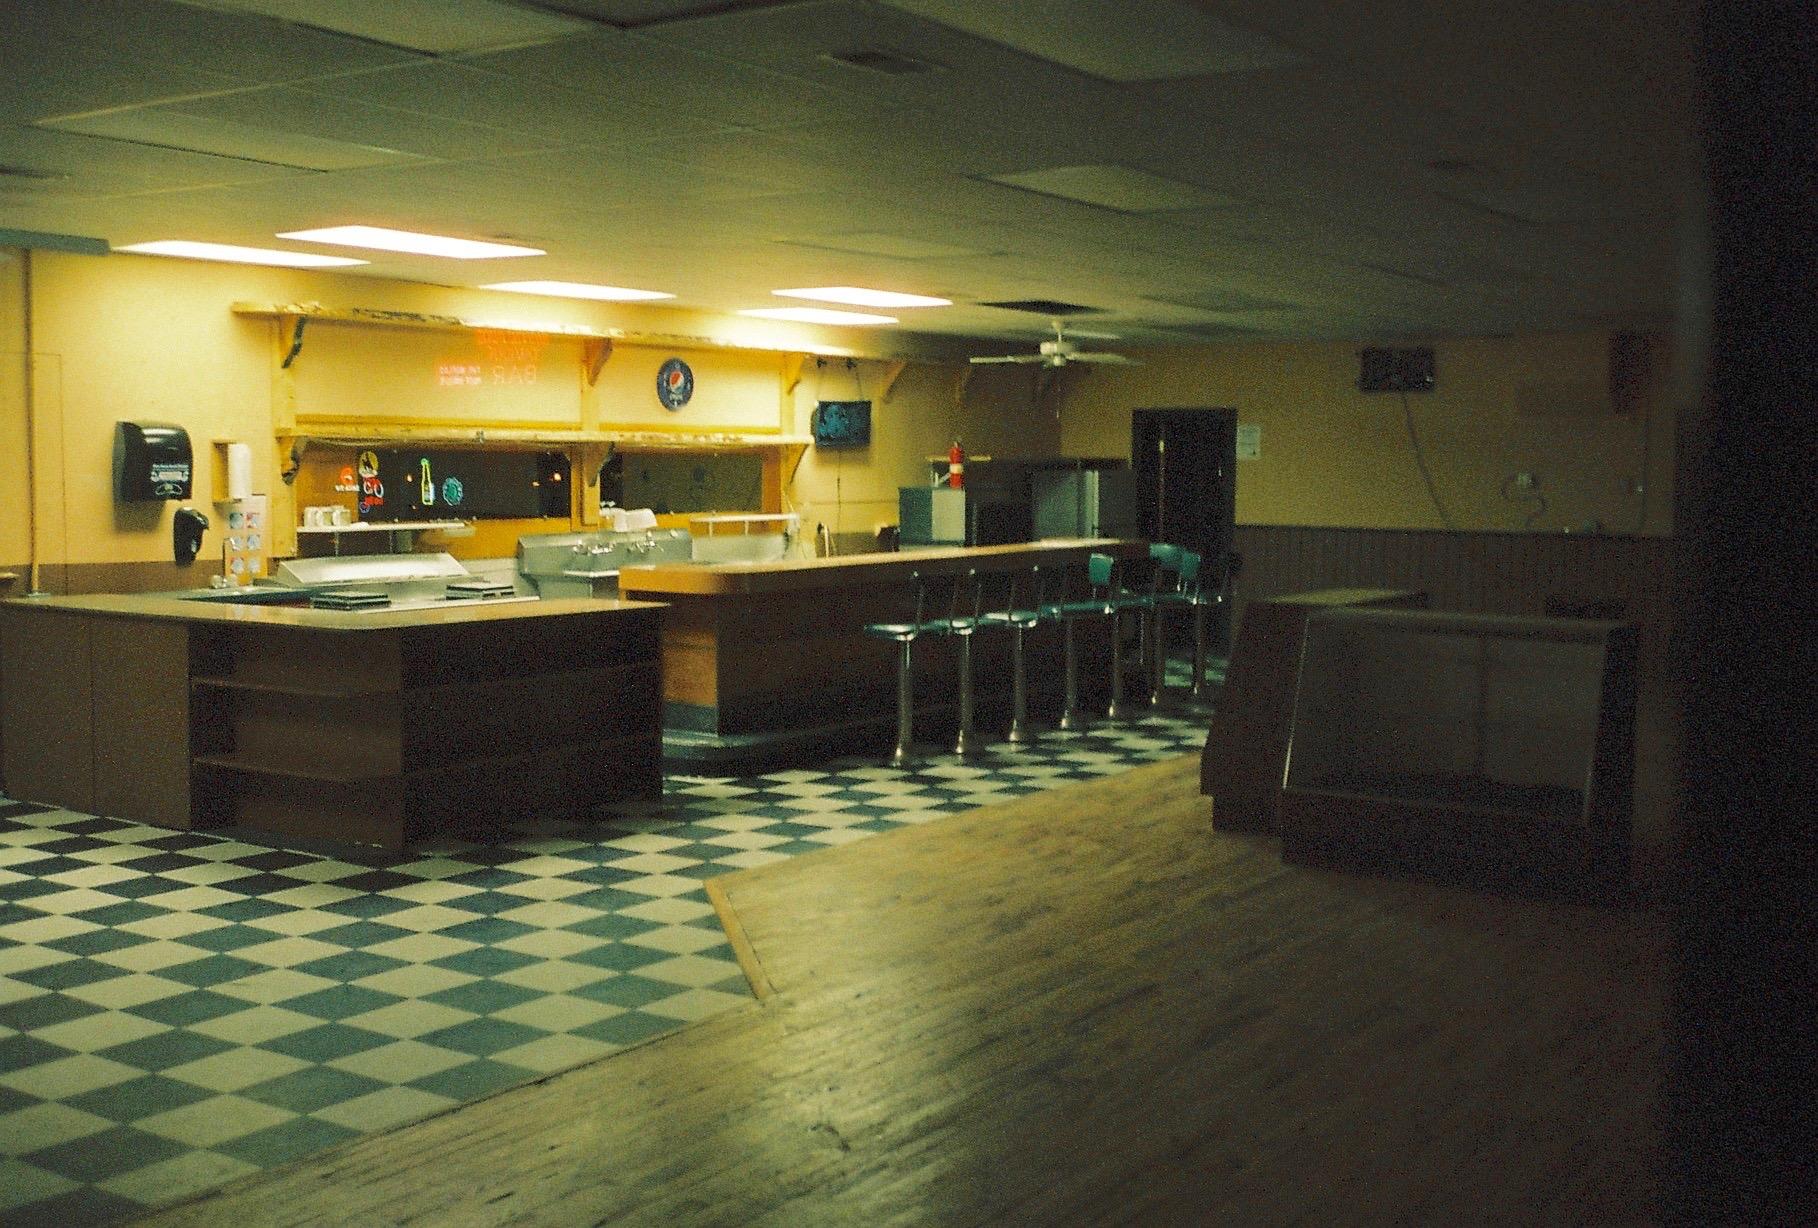 Interior of an empty bar